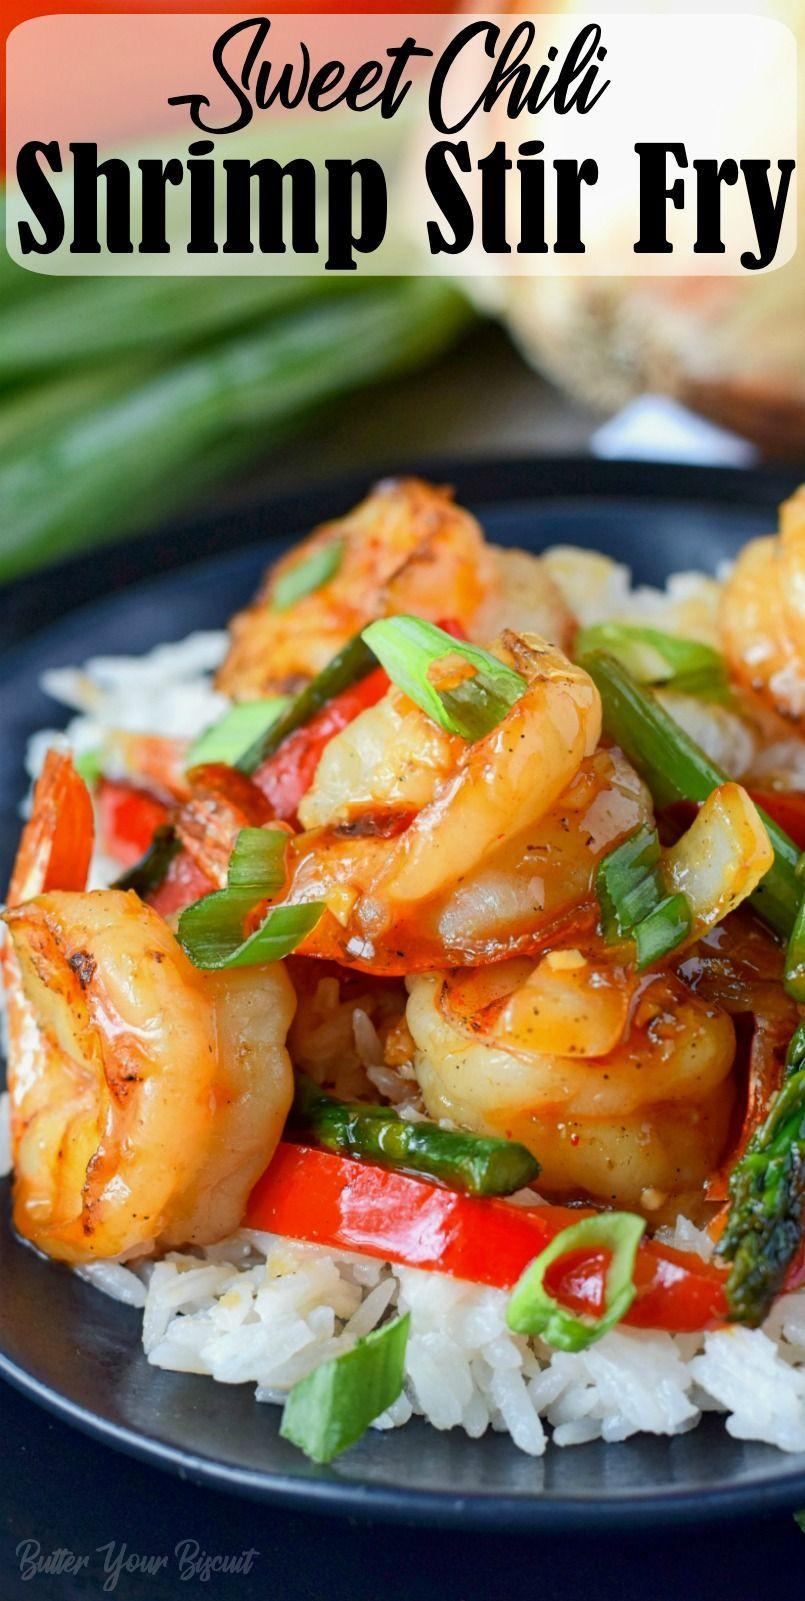 Sweet Chili Shrimp Stir Fry